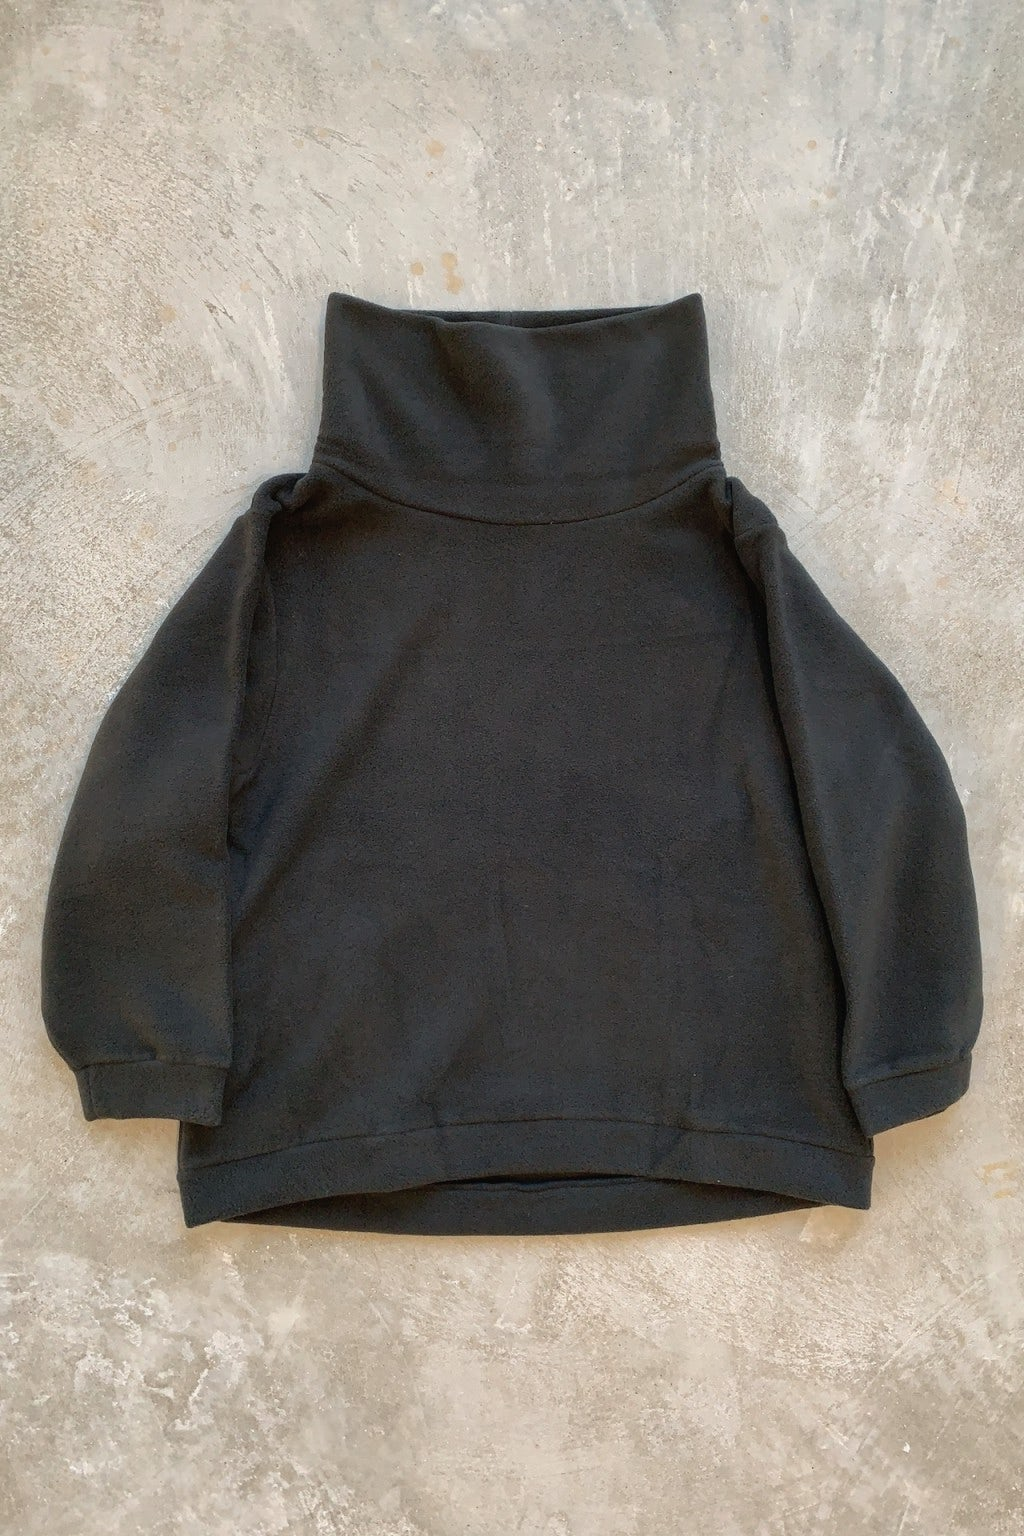 Kapital  Reverse Fleece BIG High Neck Sweat Shirt Black